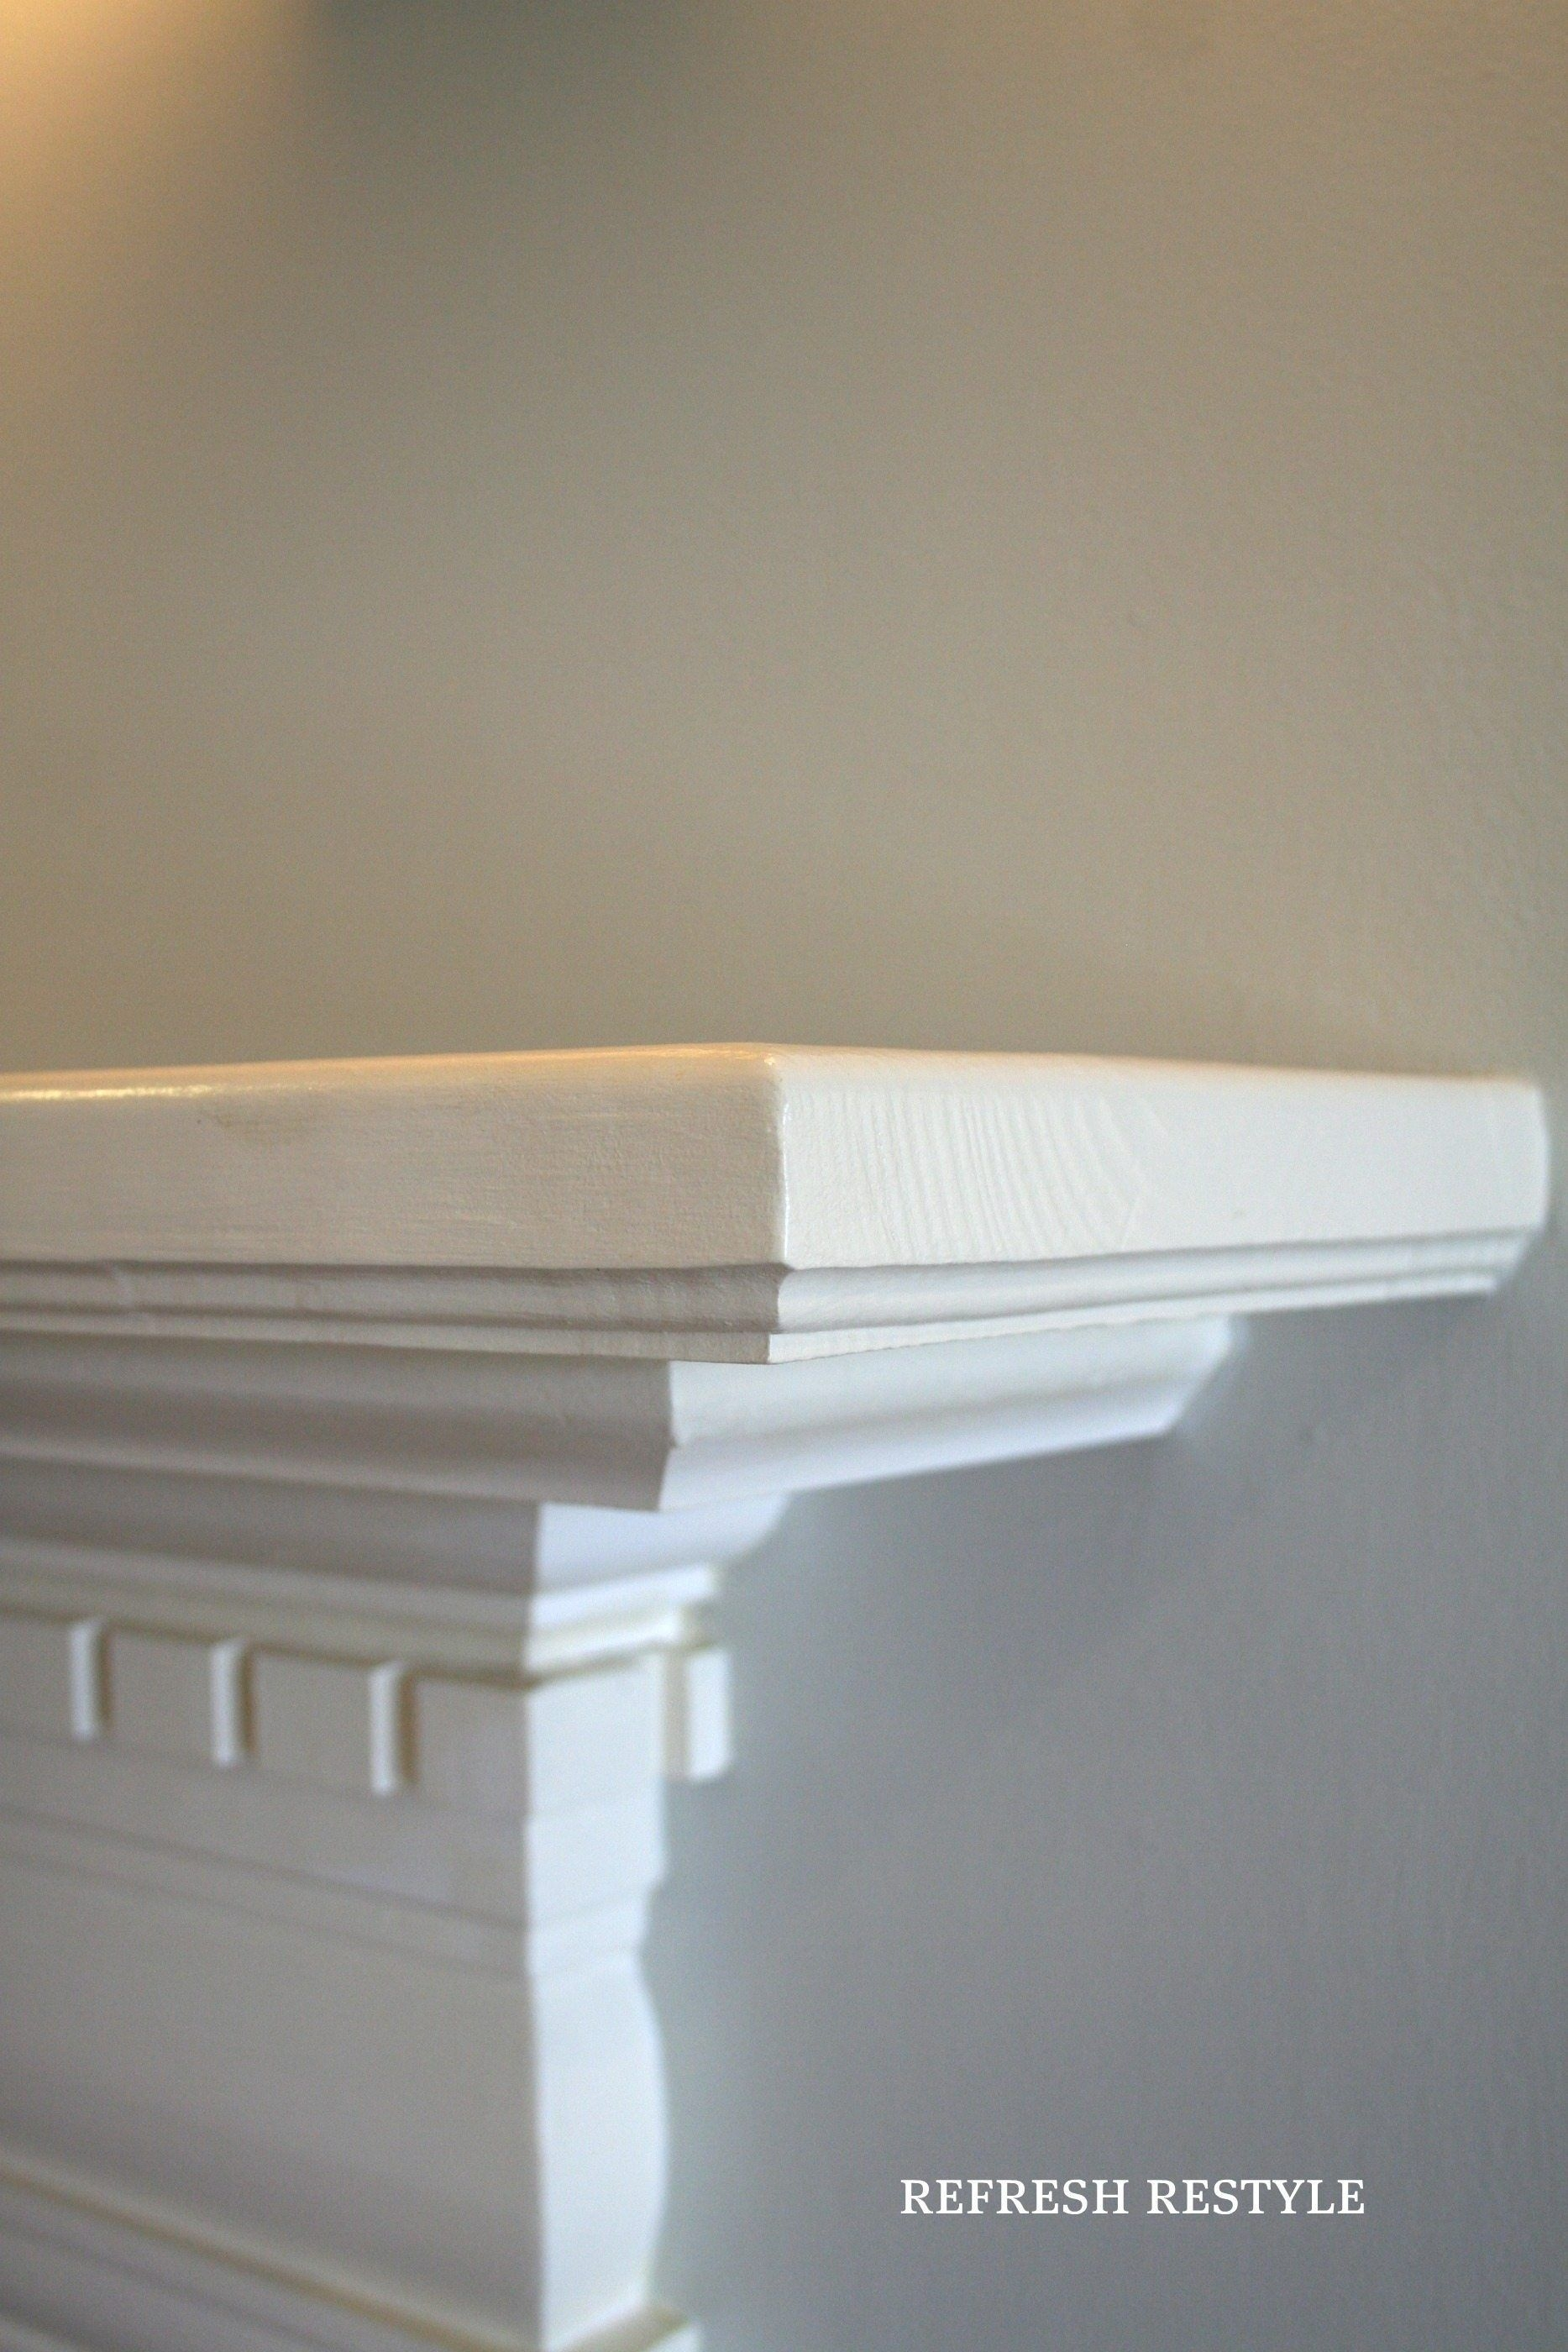 Stunning Fireplace Mantel Decor For Christmas Ideas 31